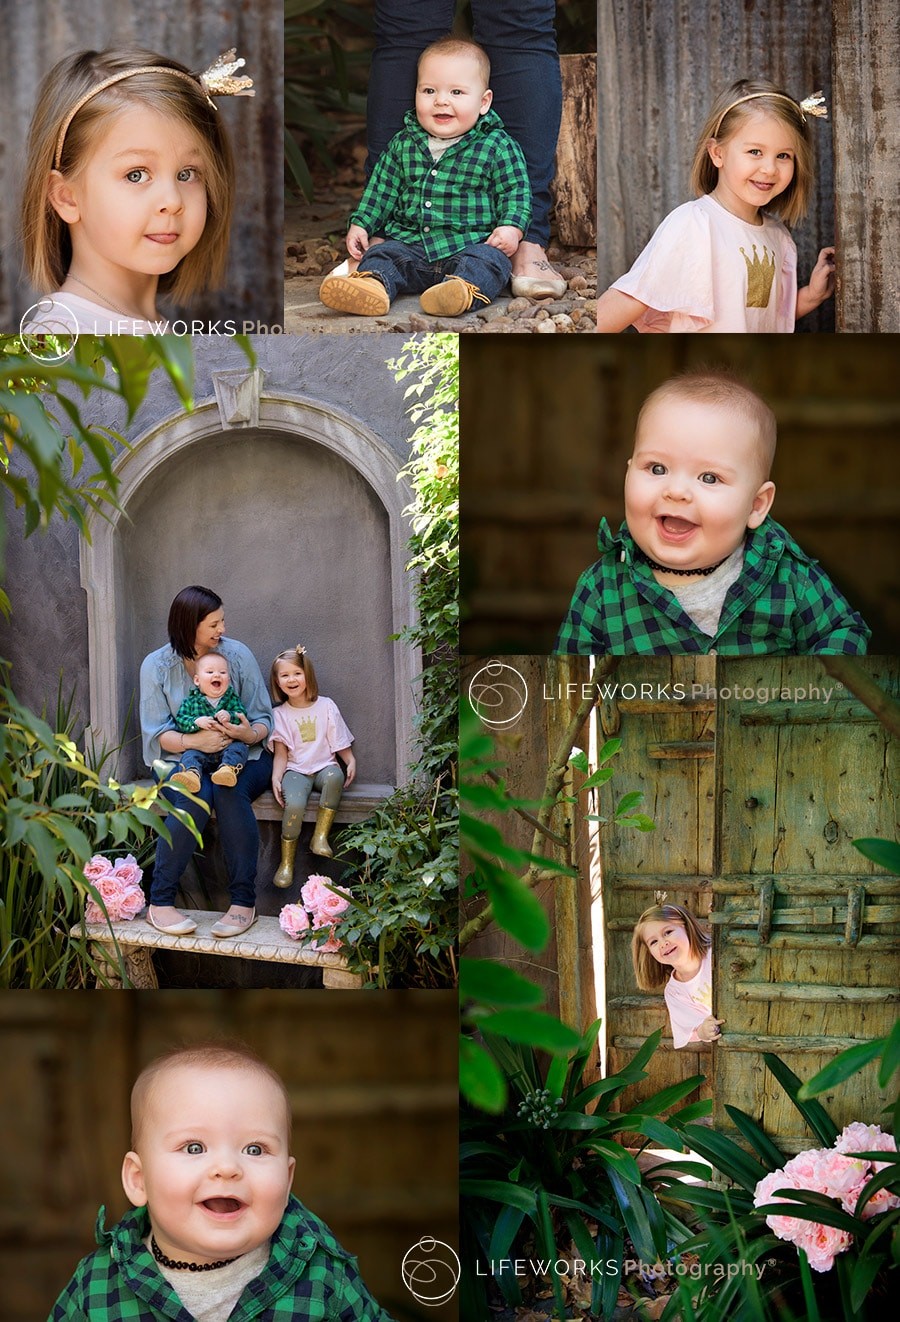 children's photography - outdoor photo shoot